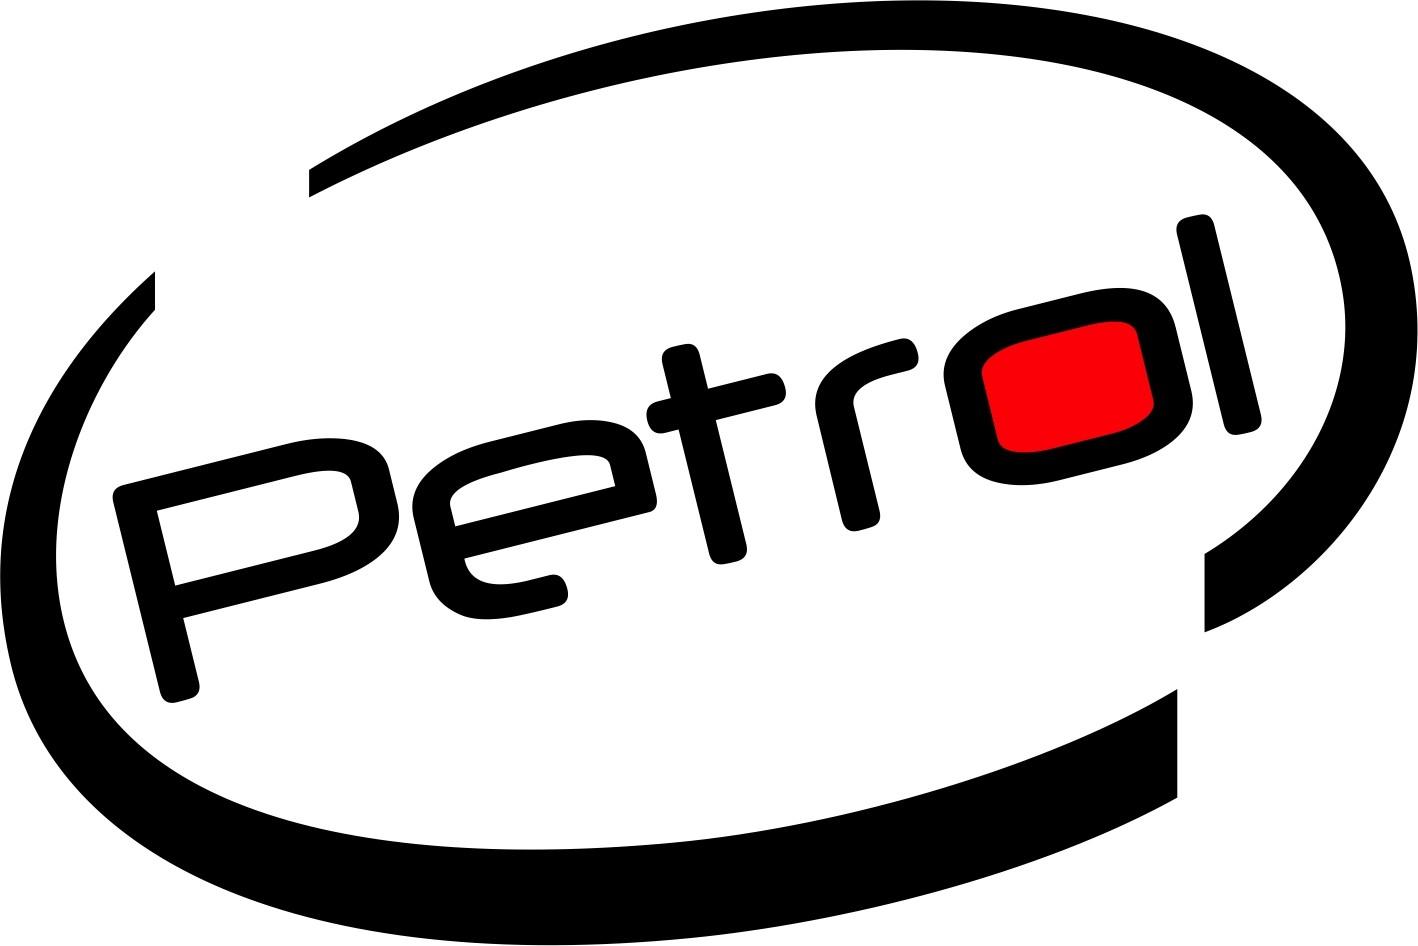 Deals - Bangalore - Extra 20% Off <br> For Cars & Bikes<br> Category - automotive<br> Business - Flipkart.com